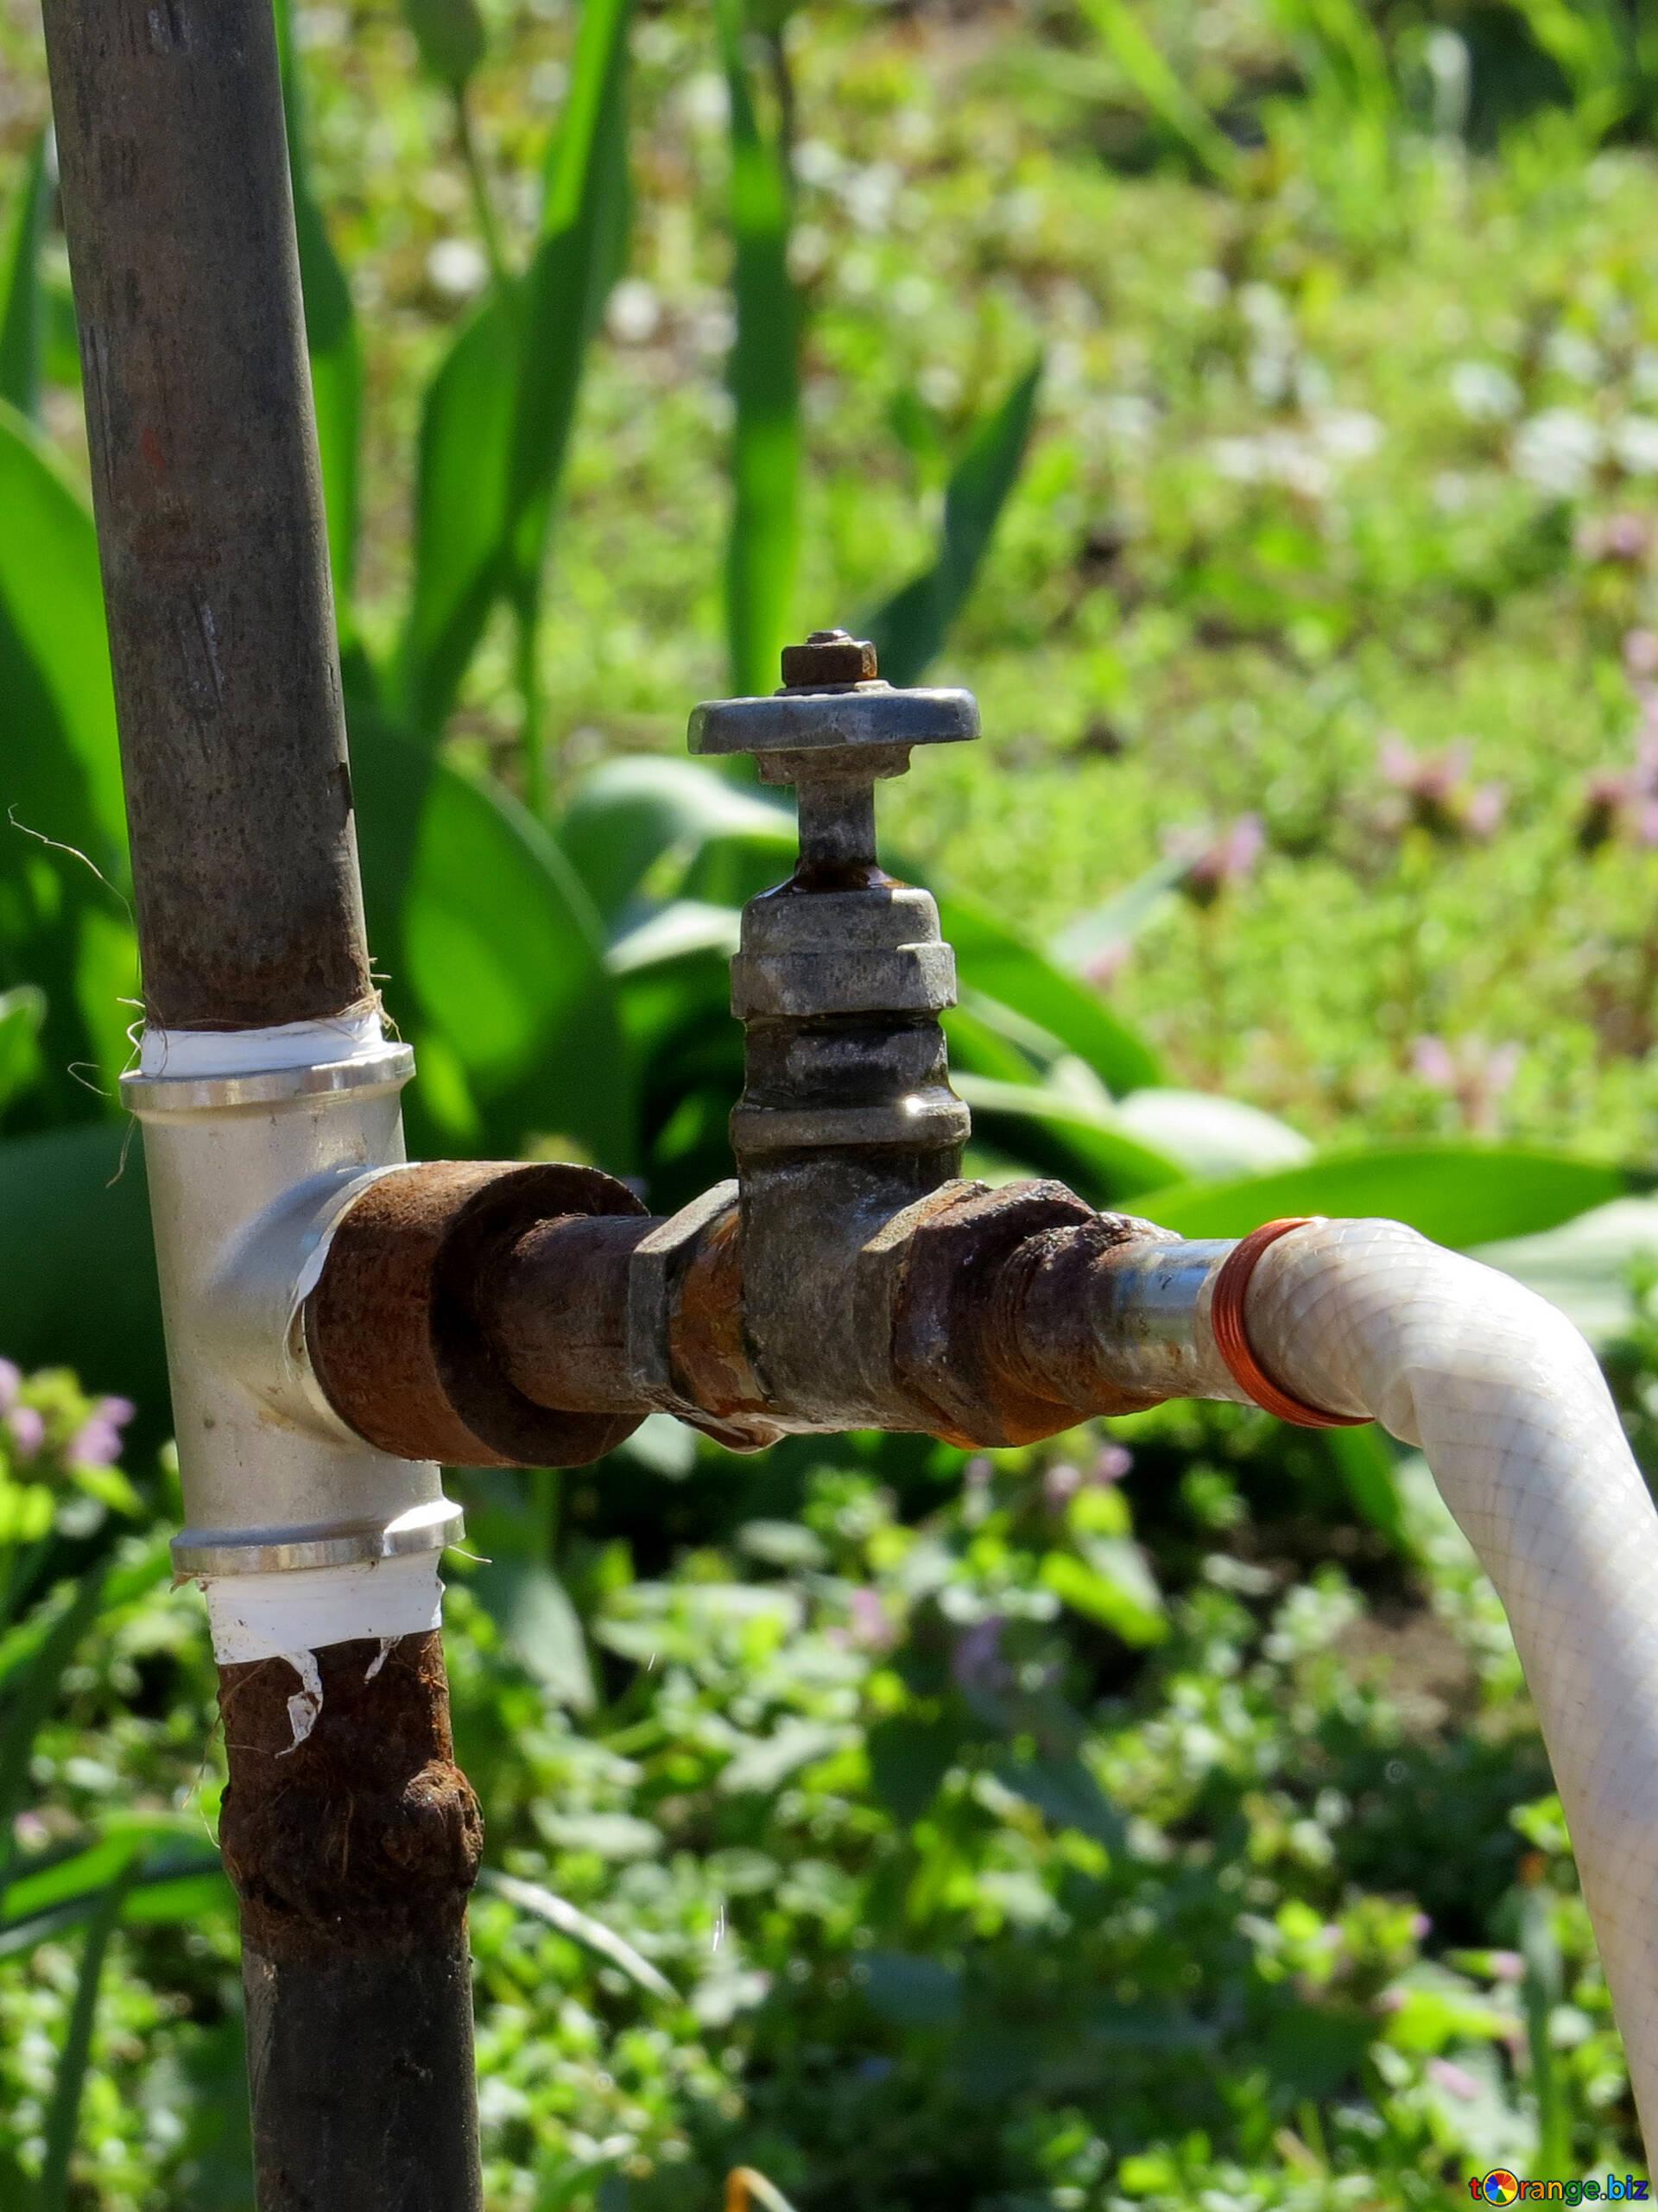 Watering Plants Tap Water Drop 23879